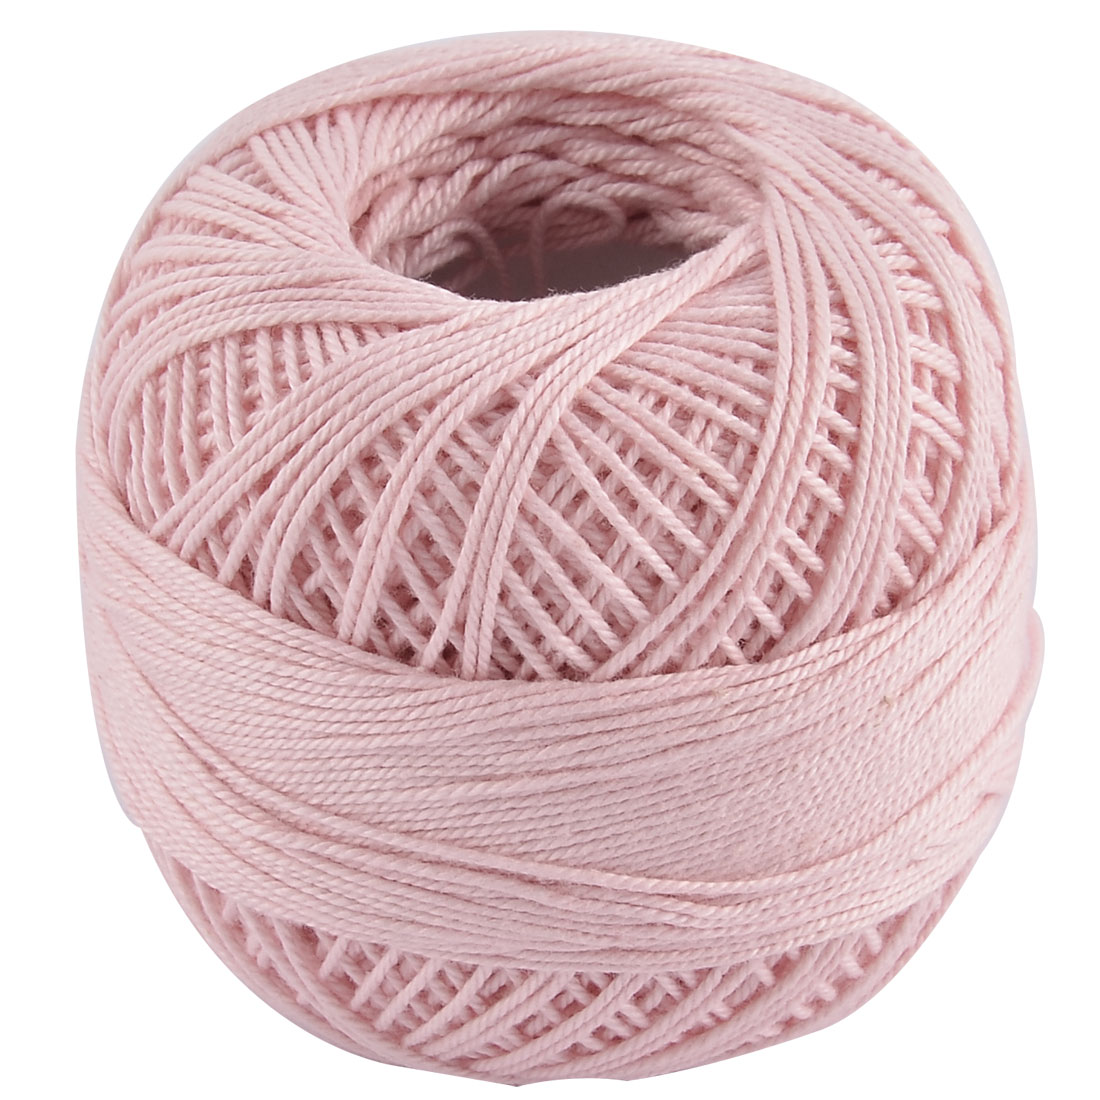 Cotton Tatting Crochet Weaving Glove Shawl Sweater Yarn Thread Light Pink